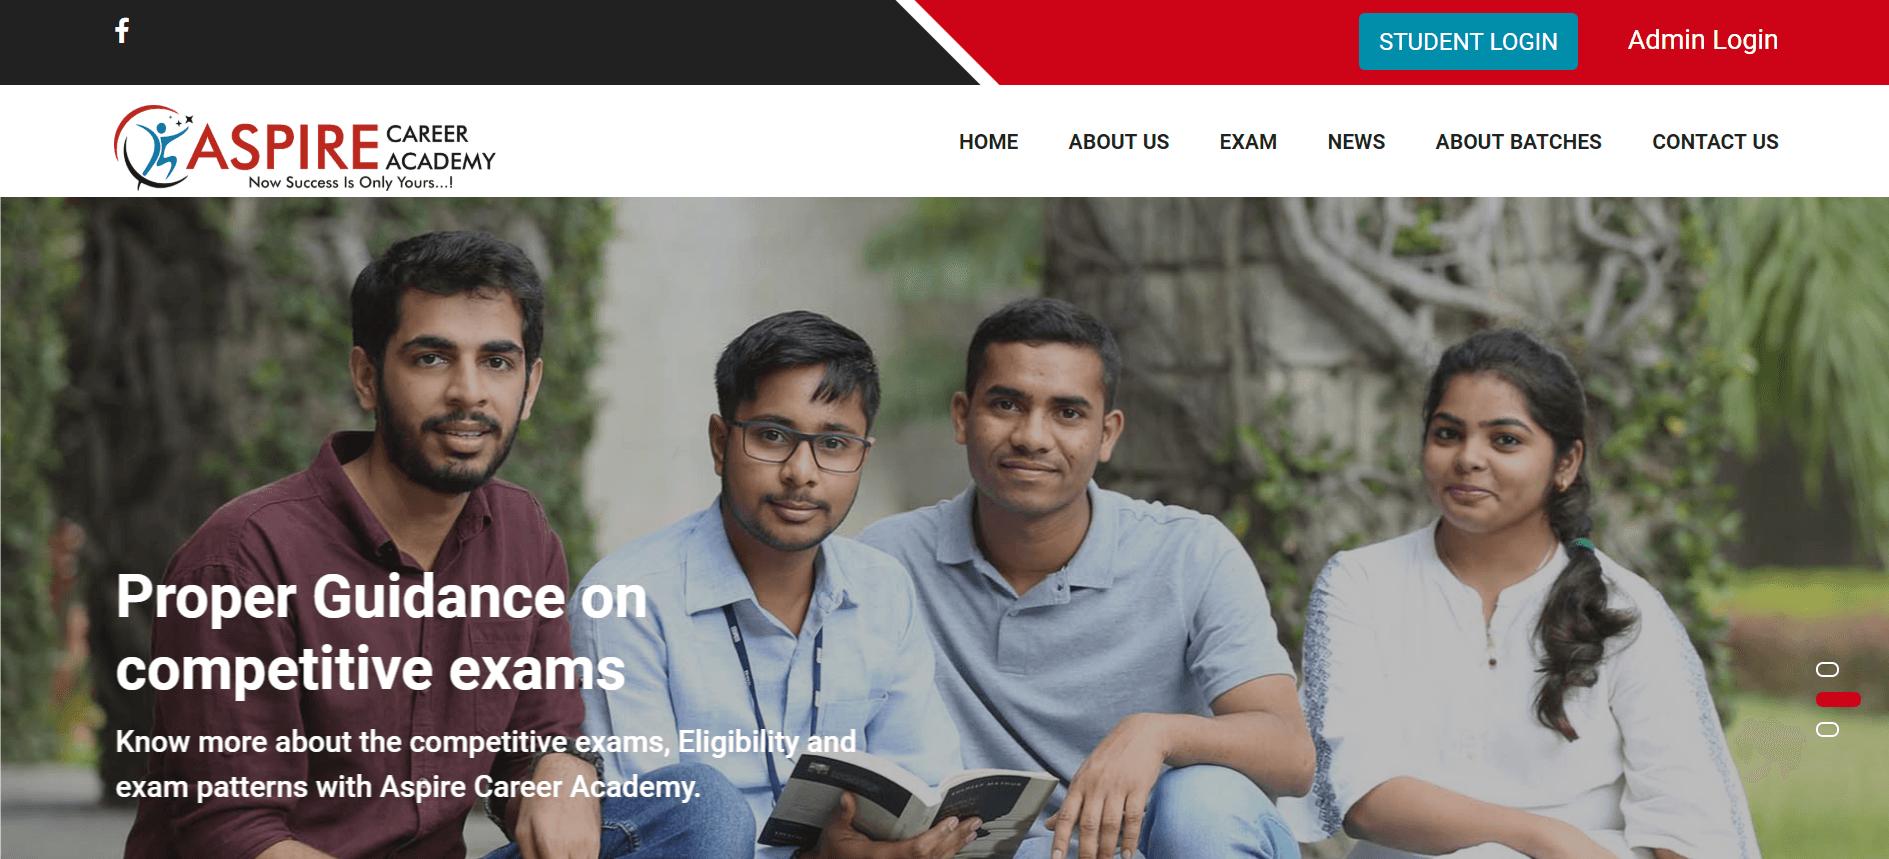 IIT-JEE Coaching Institutes in Kota [aspire career academy]